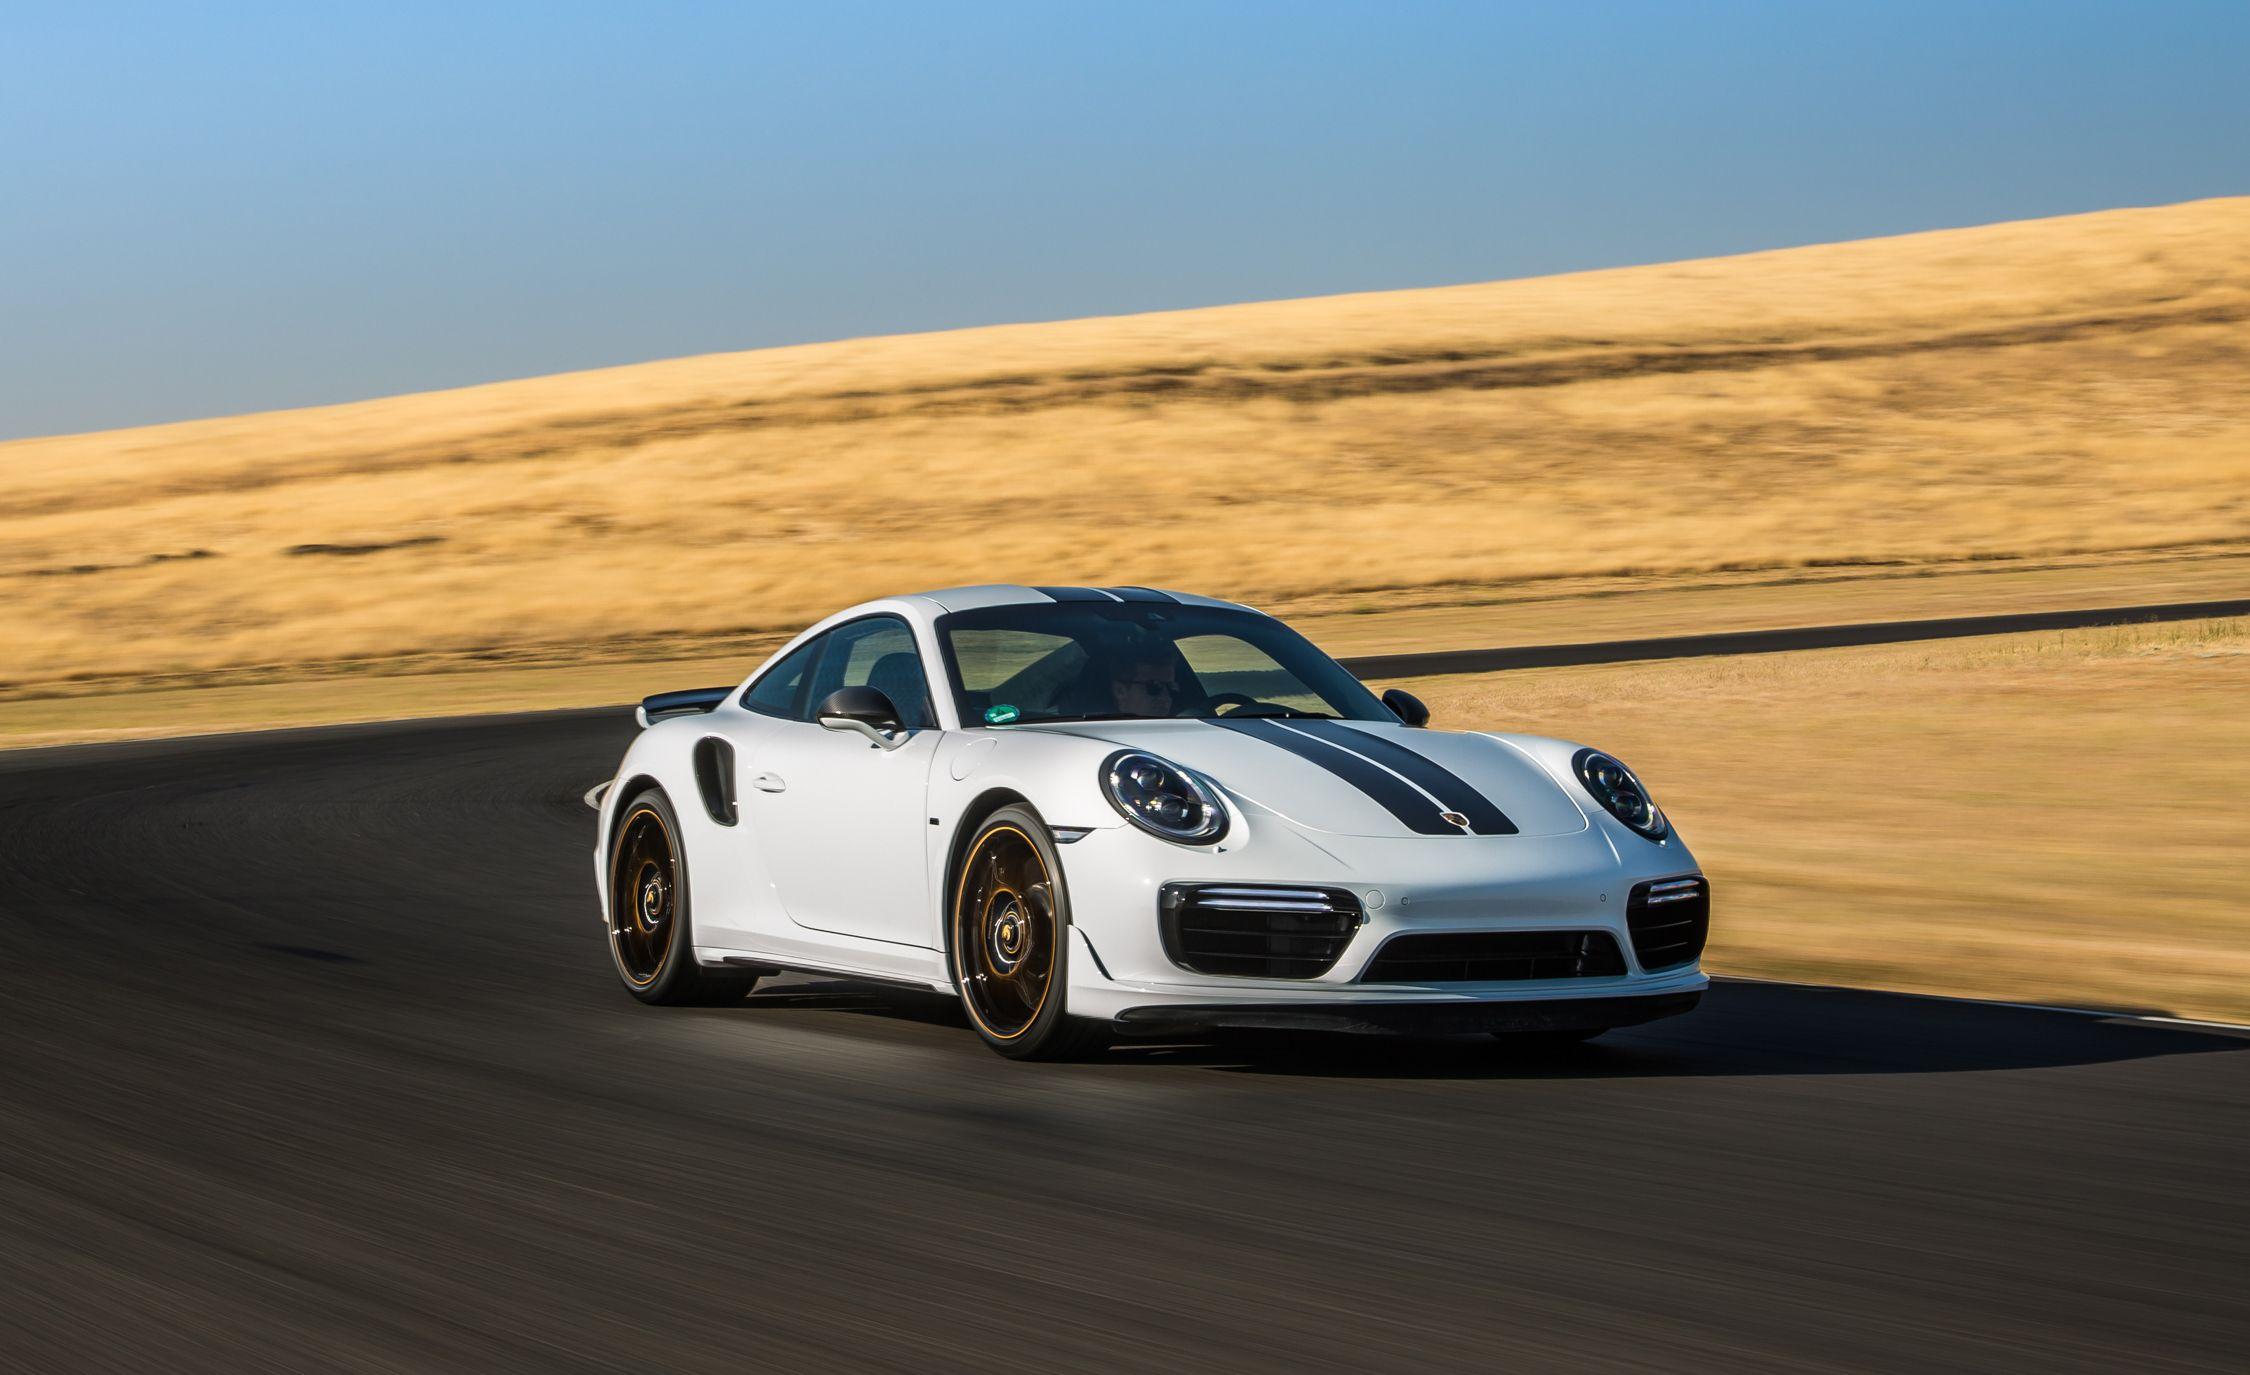 porsche 911 turbo turbo s reviews porsche 911 turbo turbo s price photos and specs car. Black Bedroom Furniture Sets. Home Design Ideas